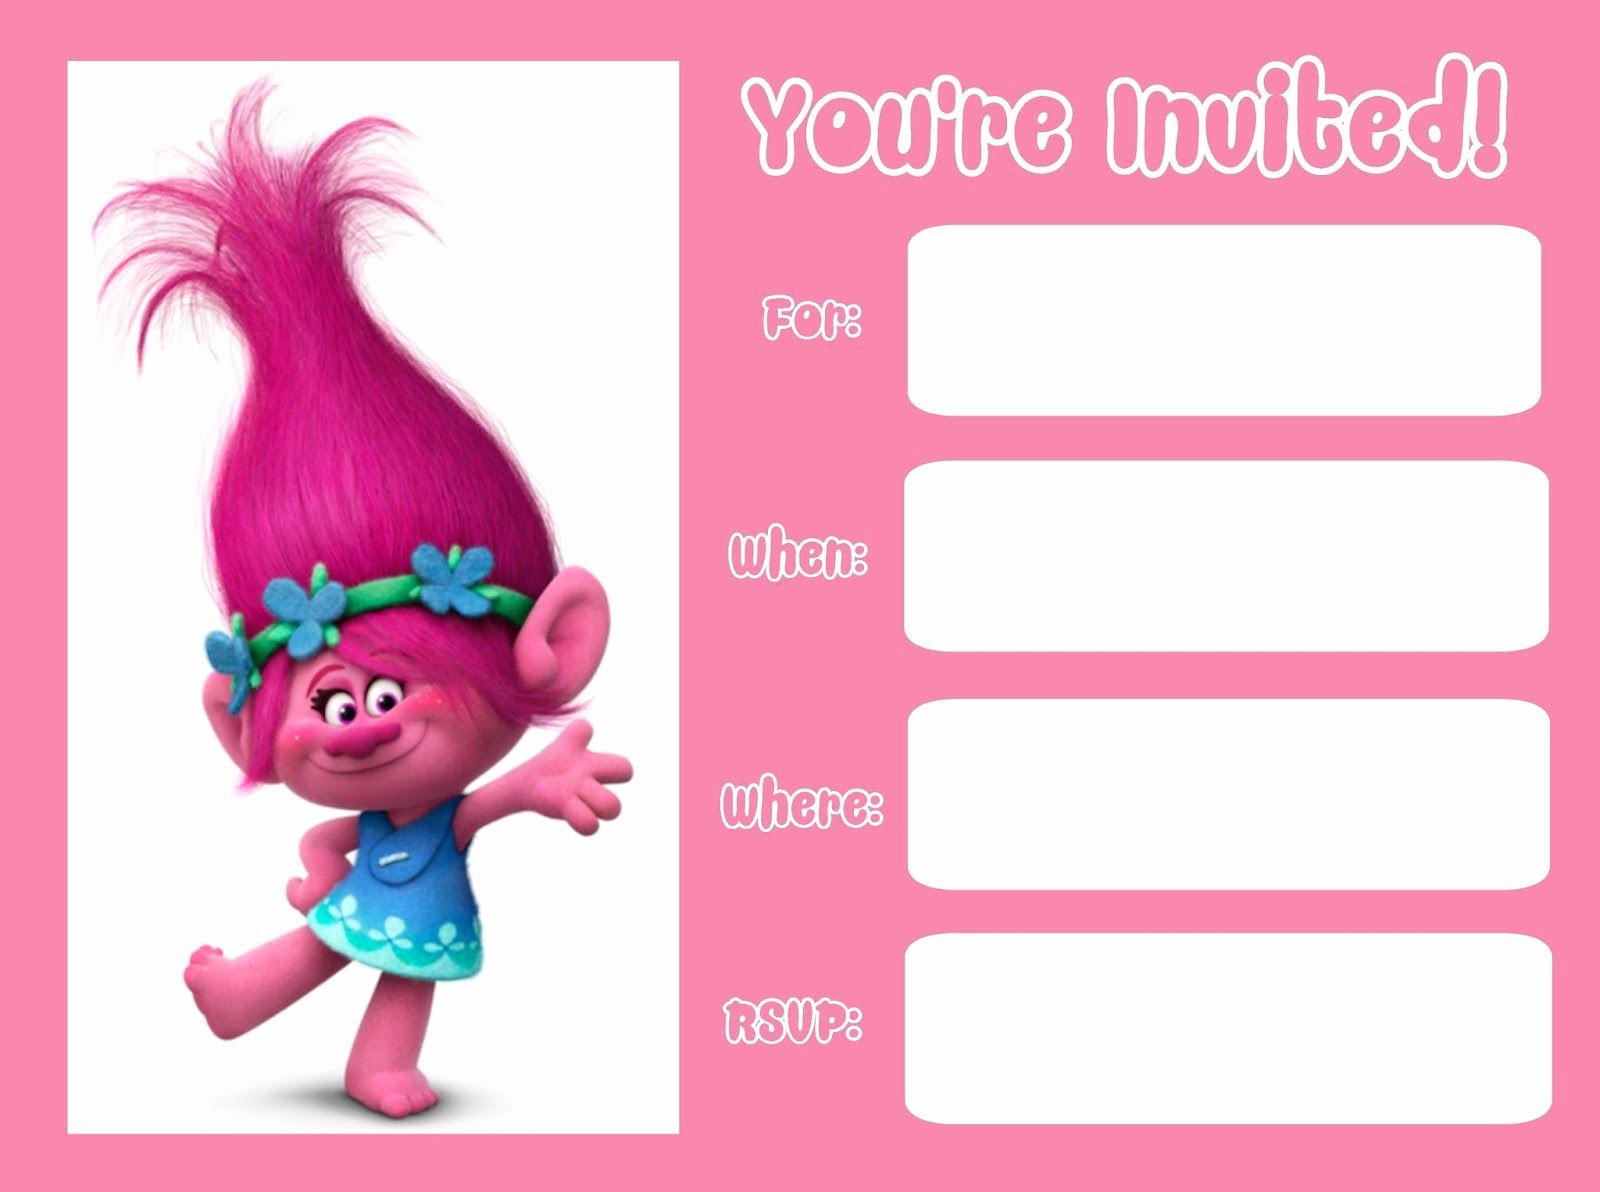 Free Trolls Invitation Template Best Of Trolls Movie 2016 Invitations